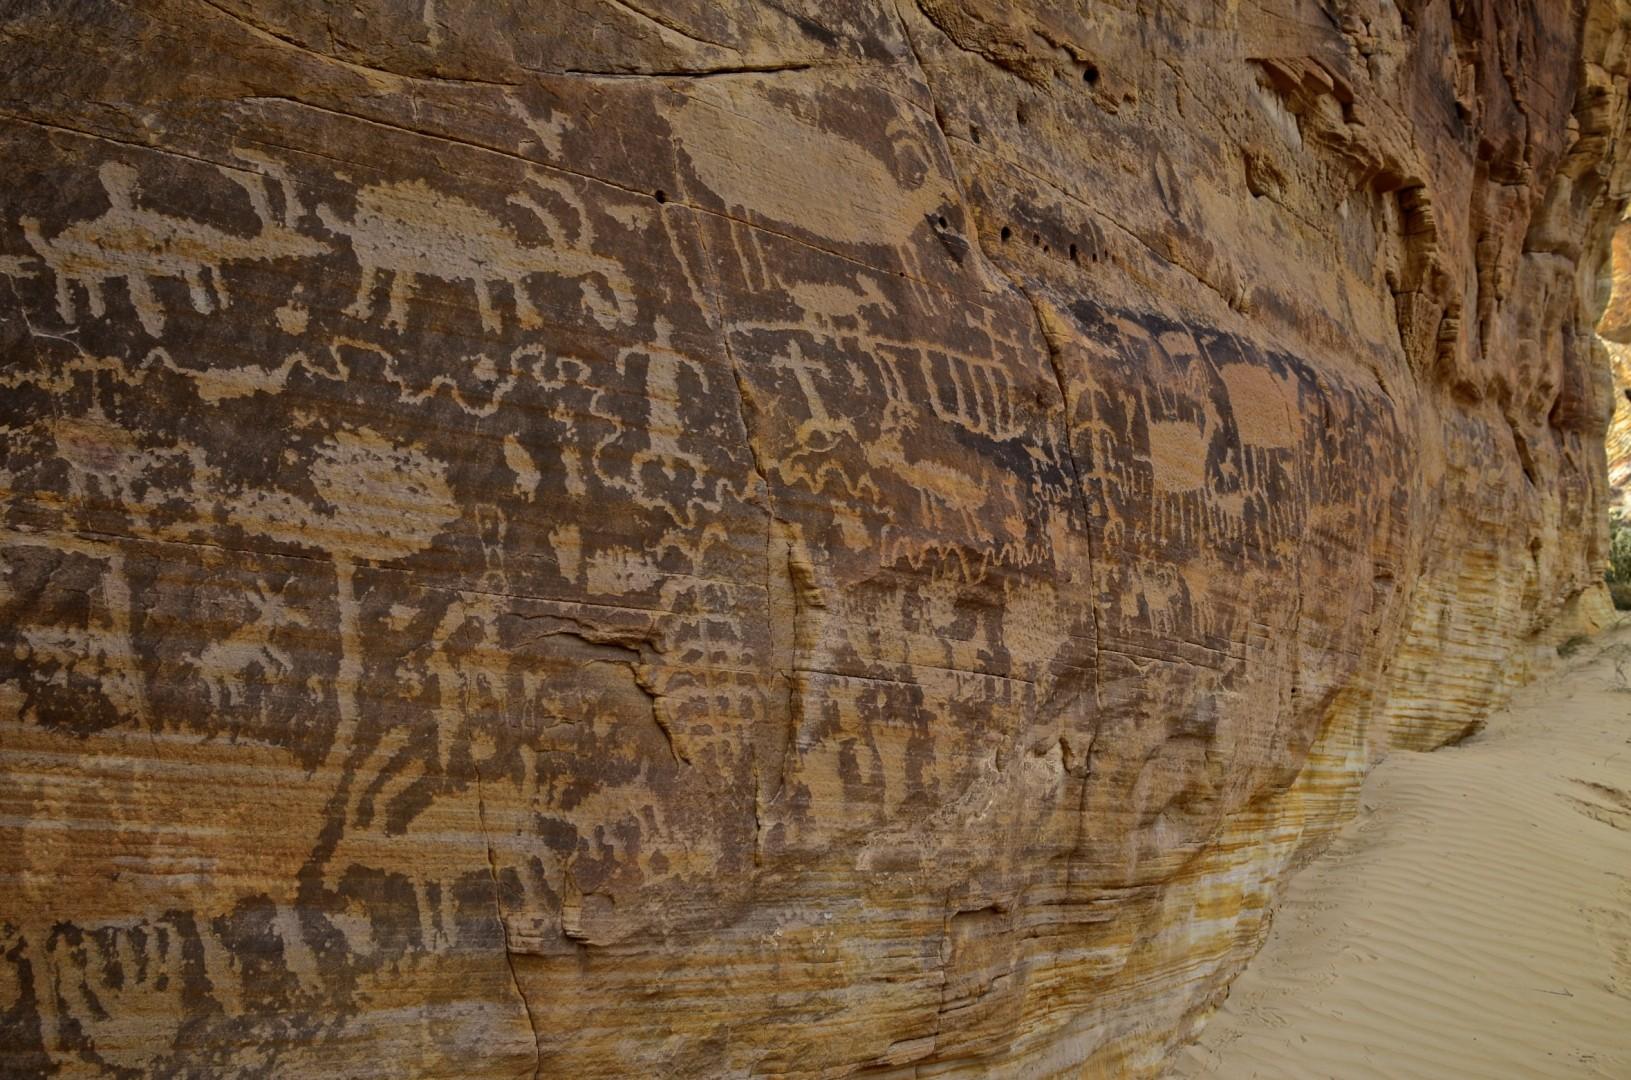 Kotha Circus Petroglyphs, near Mesquite, Nev